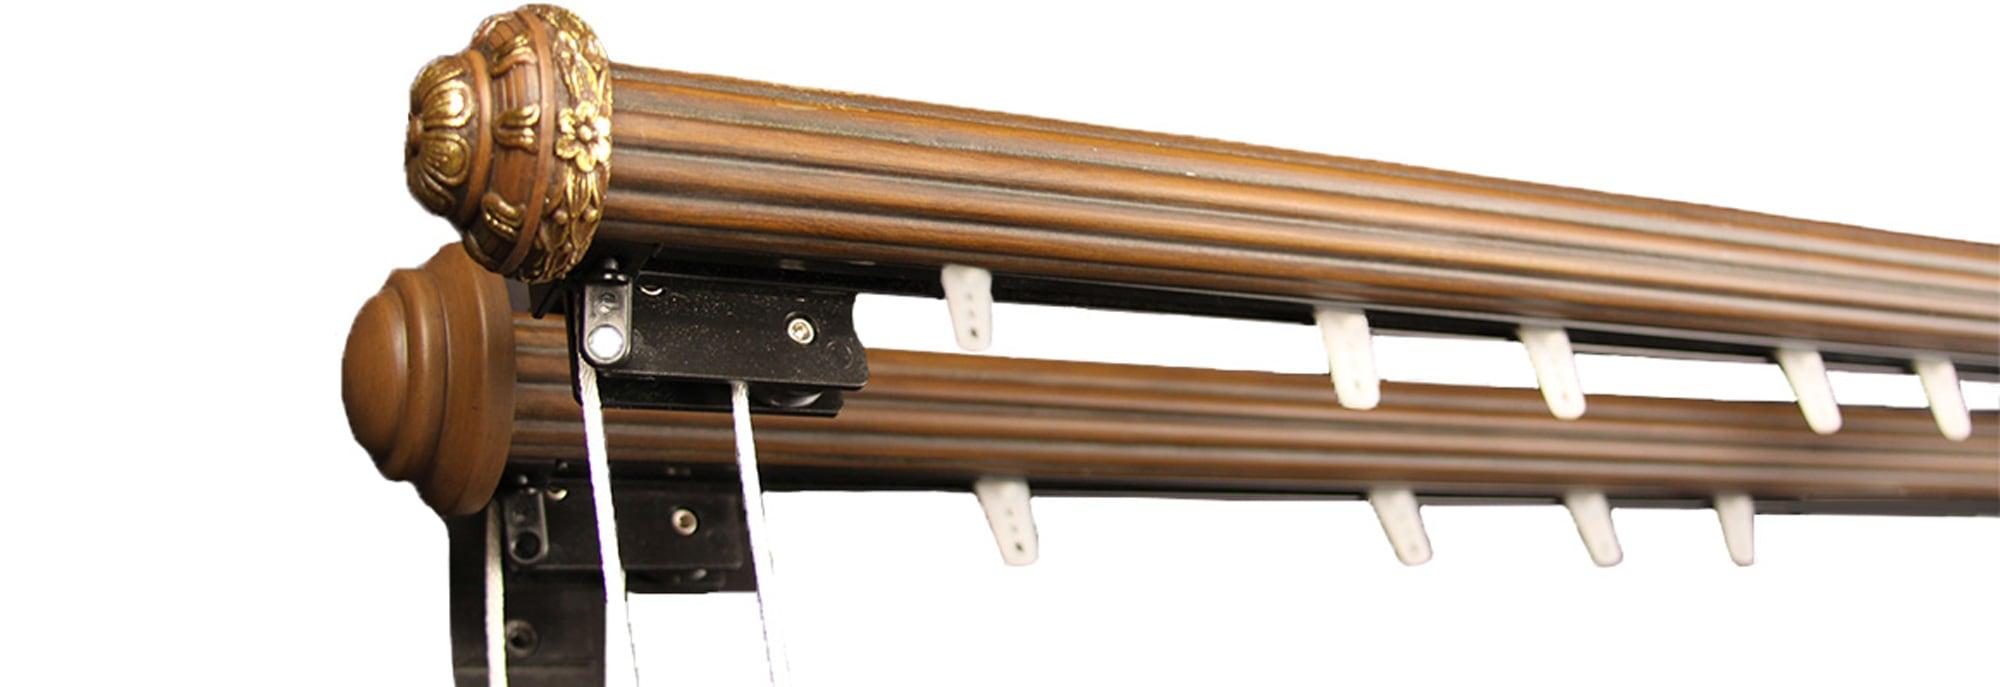 Customize Double Traverse Rod